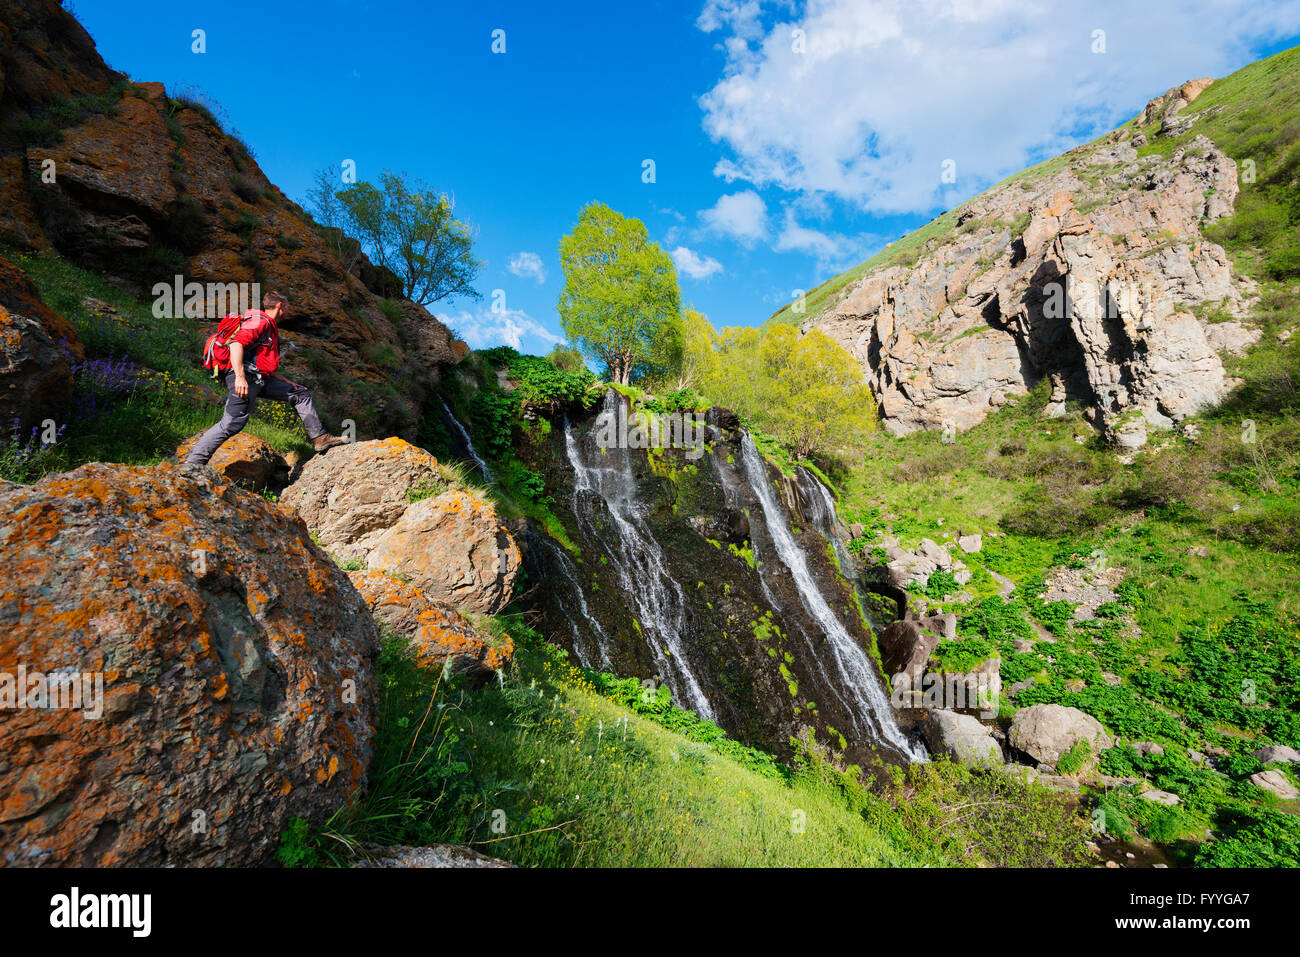 Eurasia, Caucasus region, Armenia, Syunik province, Shaki waterfall Stock Photo